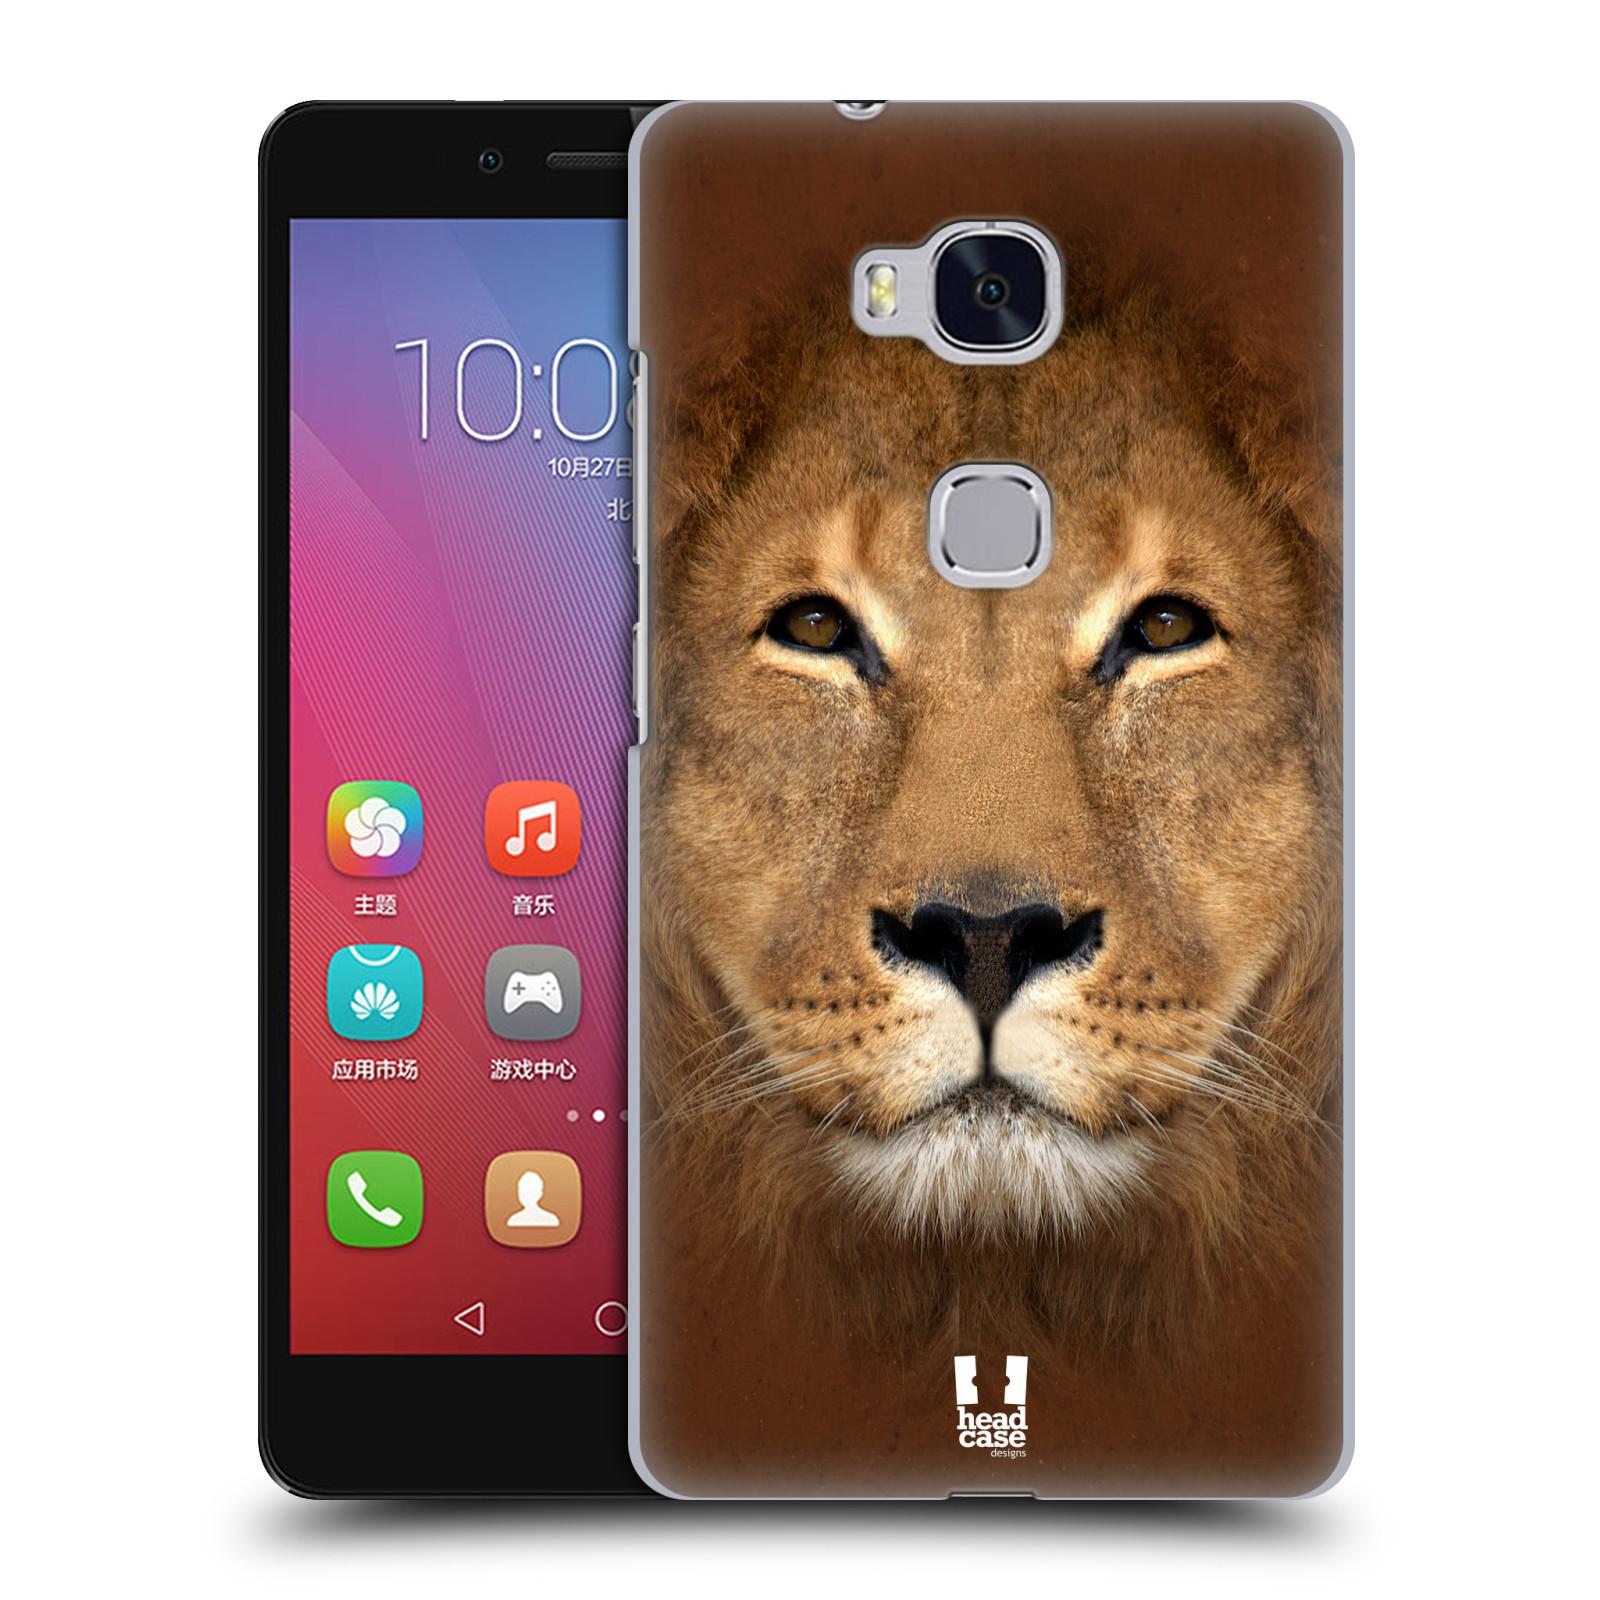 HEAD CASE pevný plastový obal na mobil HUAWEI HONOR 5X vzor Zvířecí tváře 2 Lev